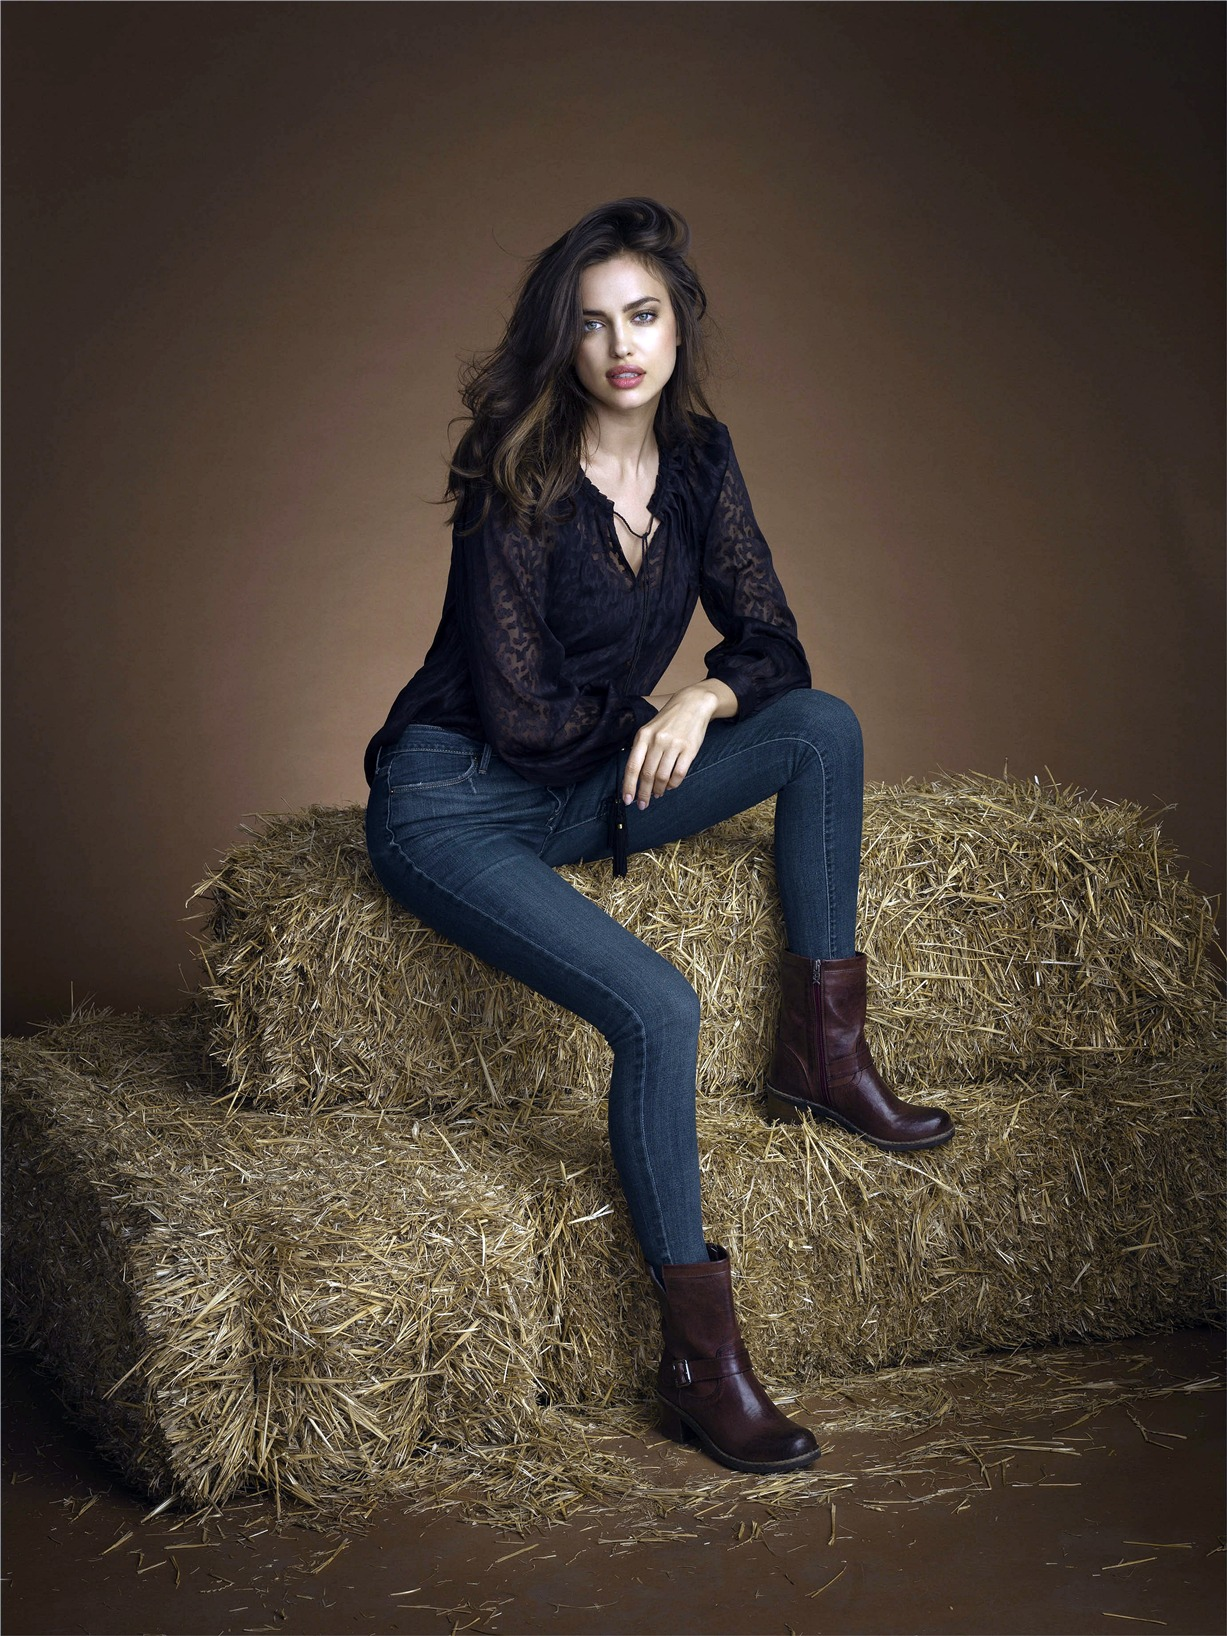 Ирина Шейк / Irina Shayk & Juan Betancourt by Santiago Esteban for Xti Footwear Fall-Winter 2013-14 campaign